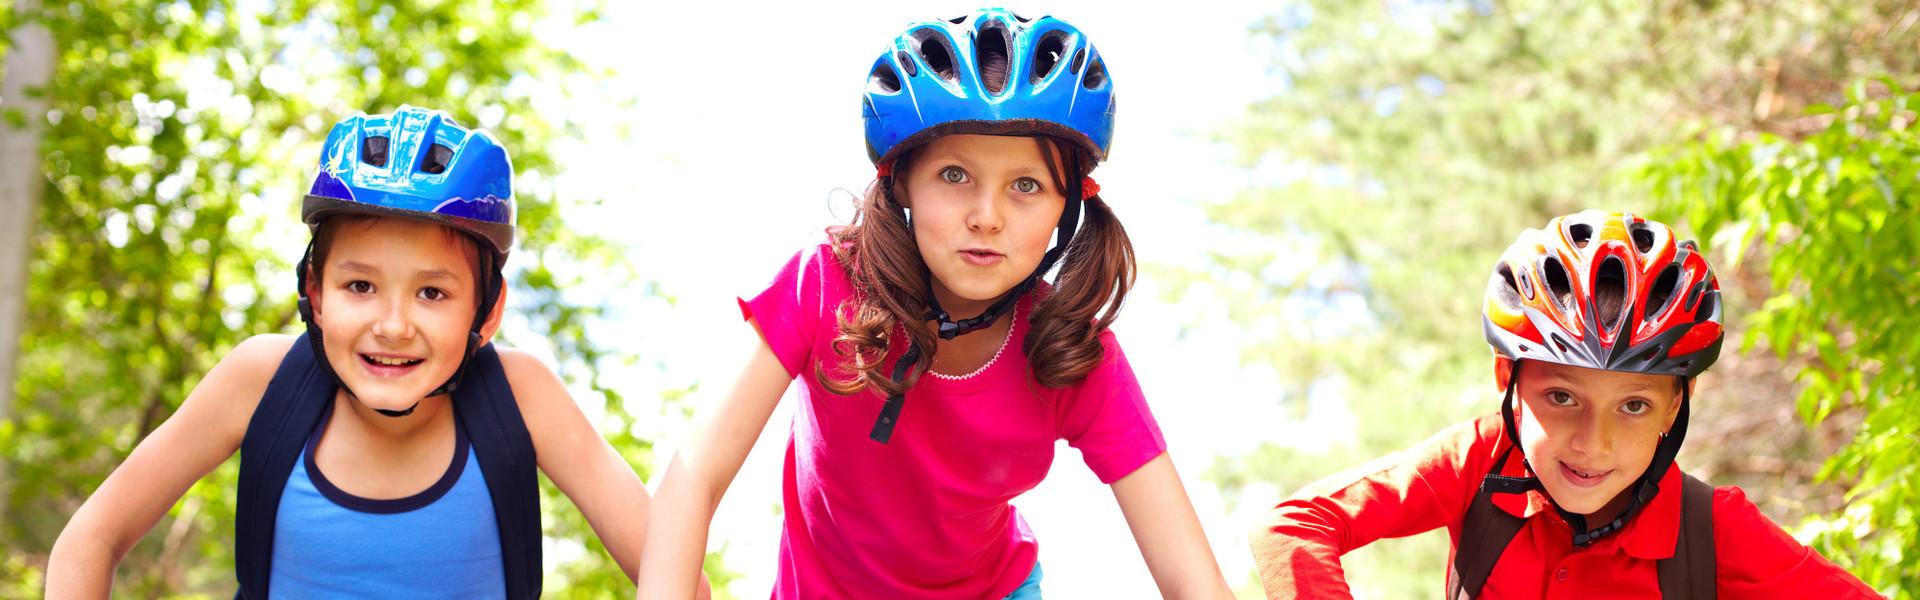 Park City, Utah Hotel and Ski Resort located near Park City Mountain | Kids Bike Riding